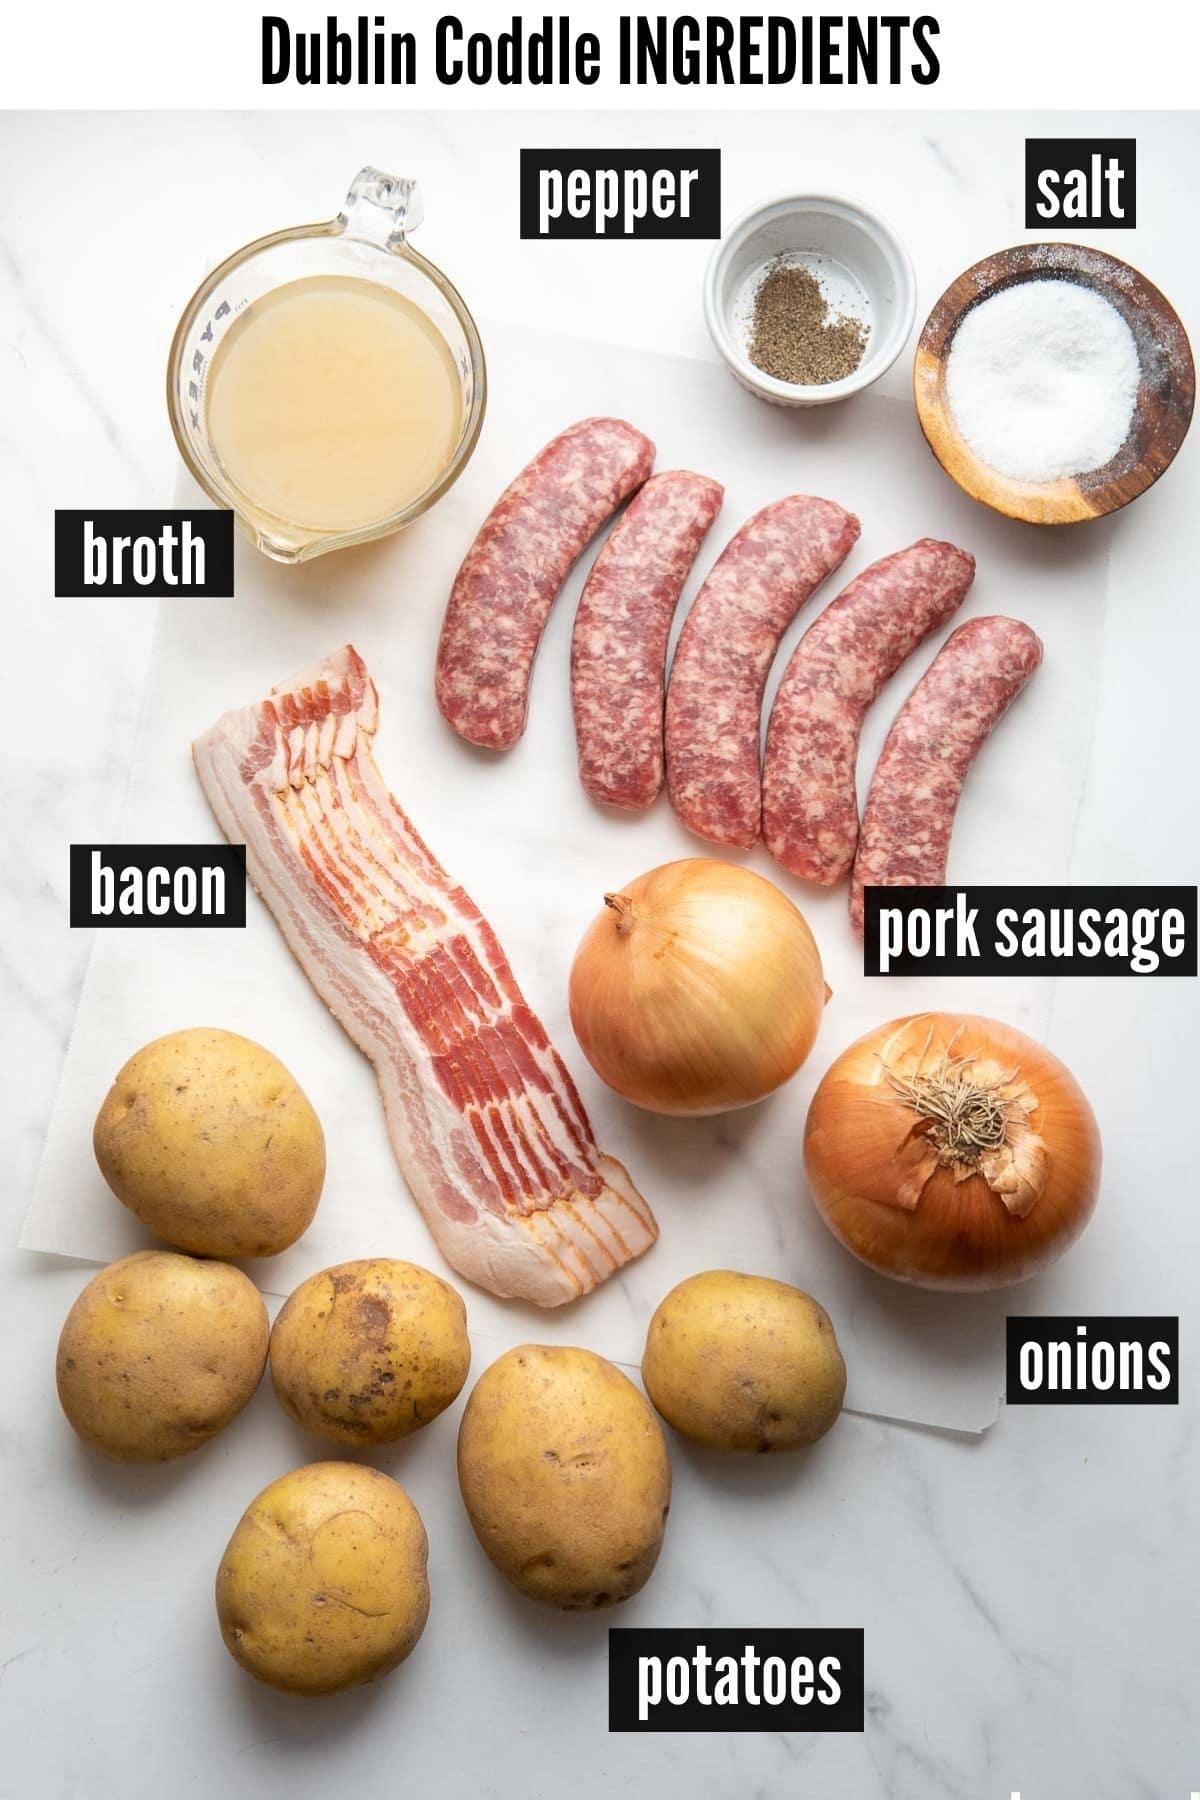 dublin coddle ingredients